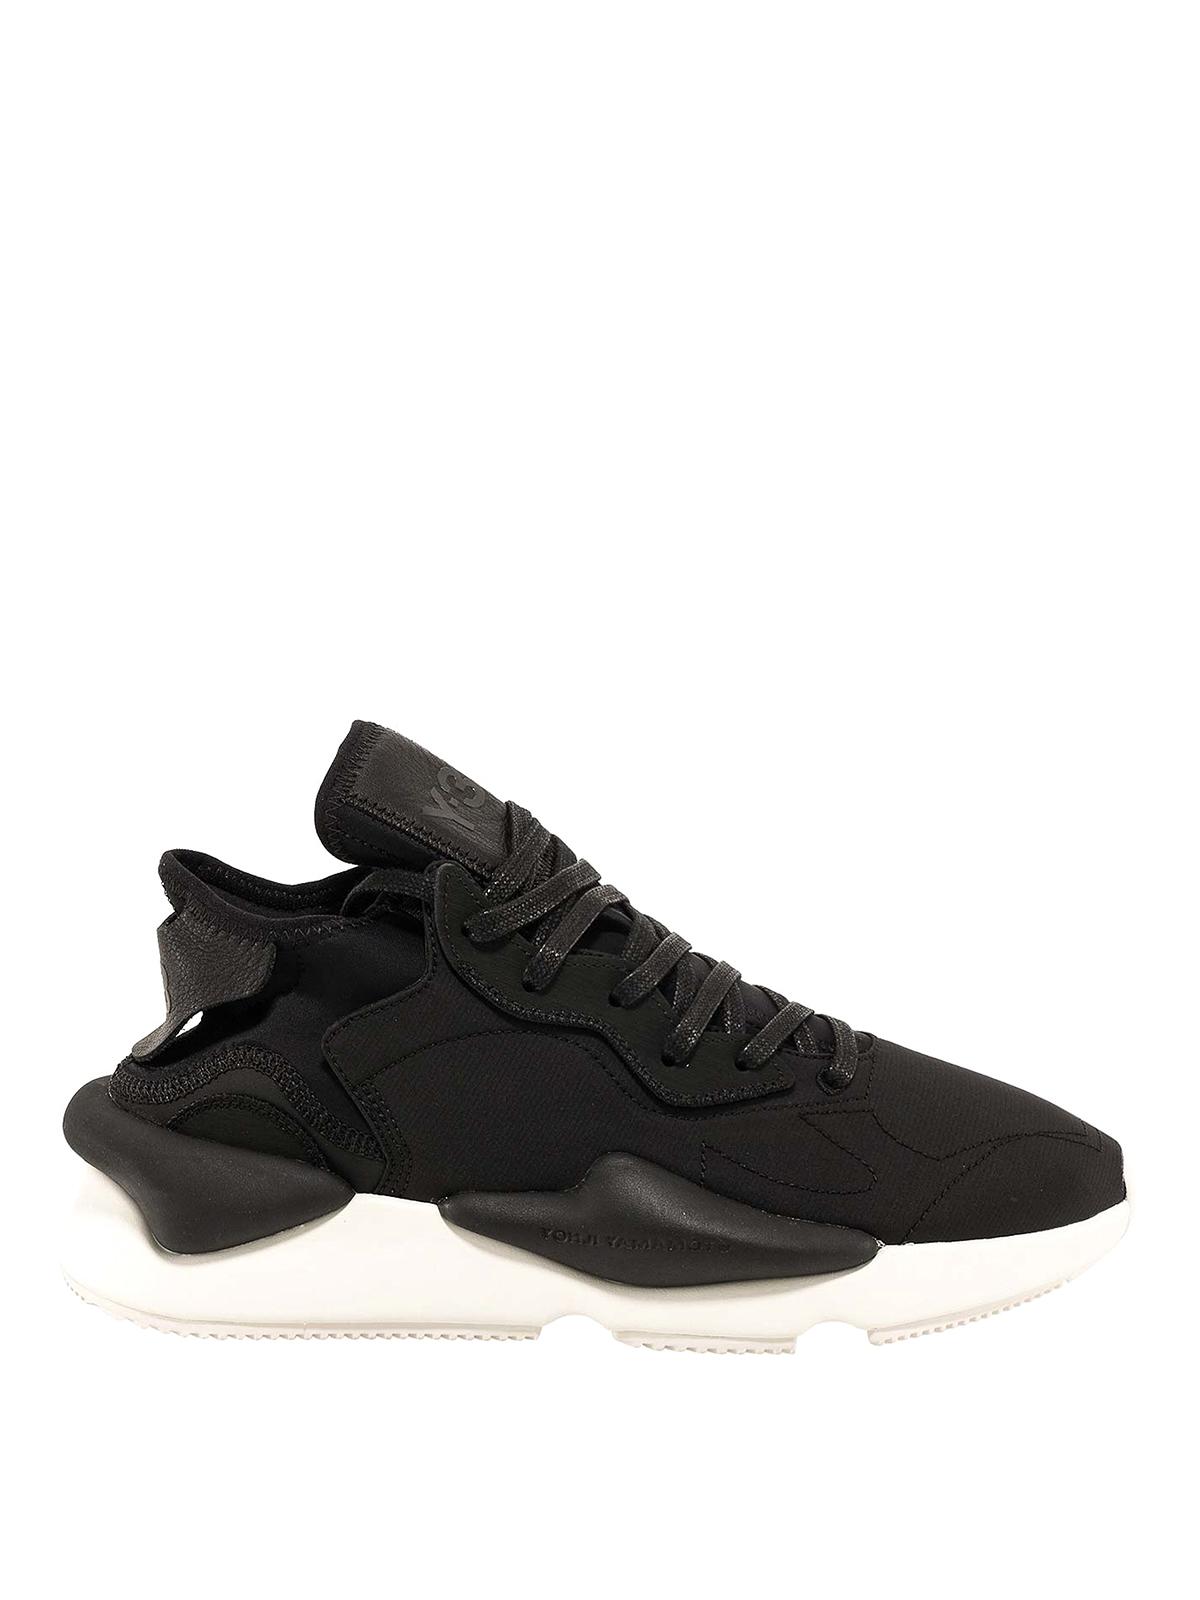 Y-3 Leathers Kaiwa sneakers